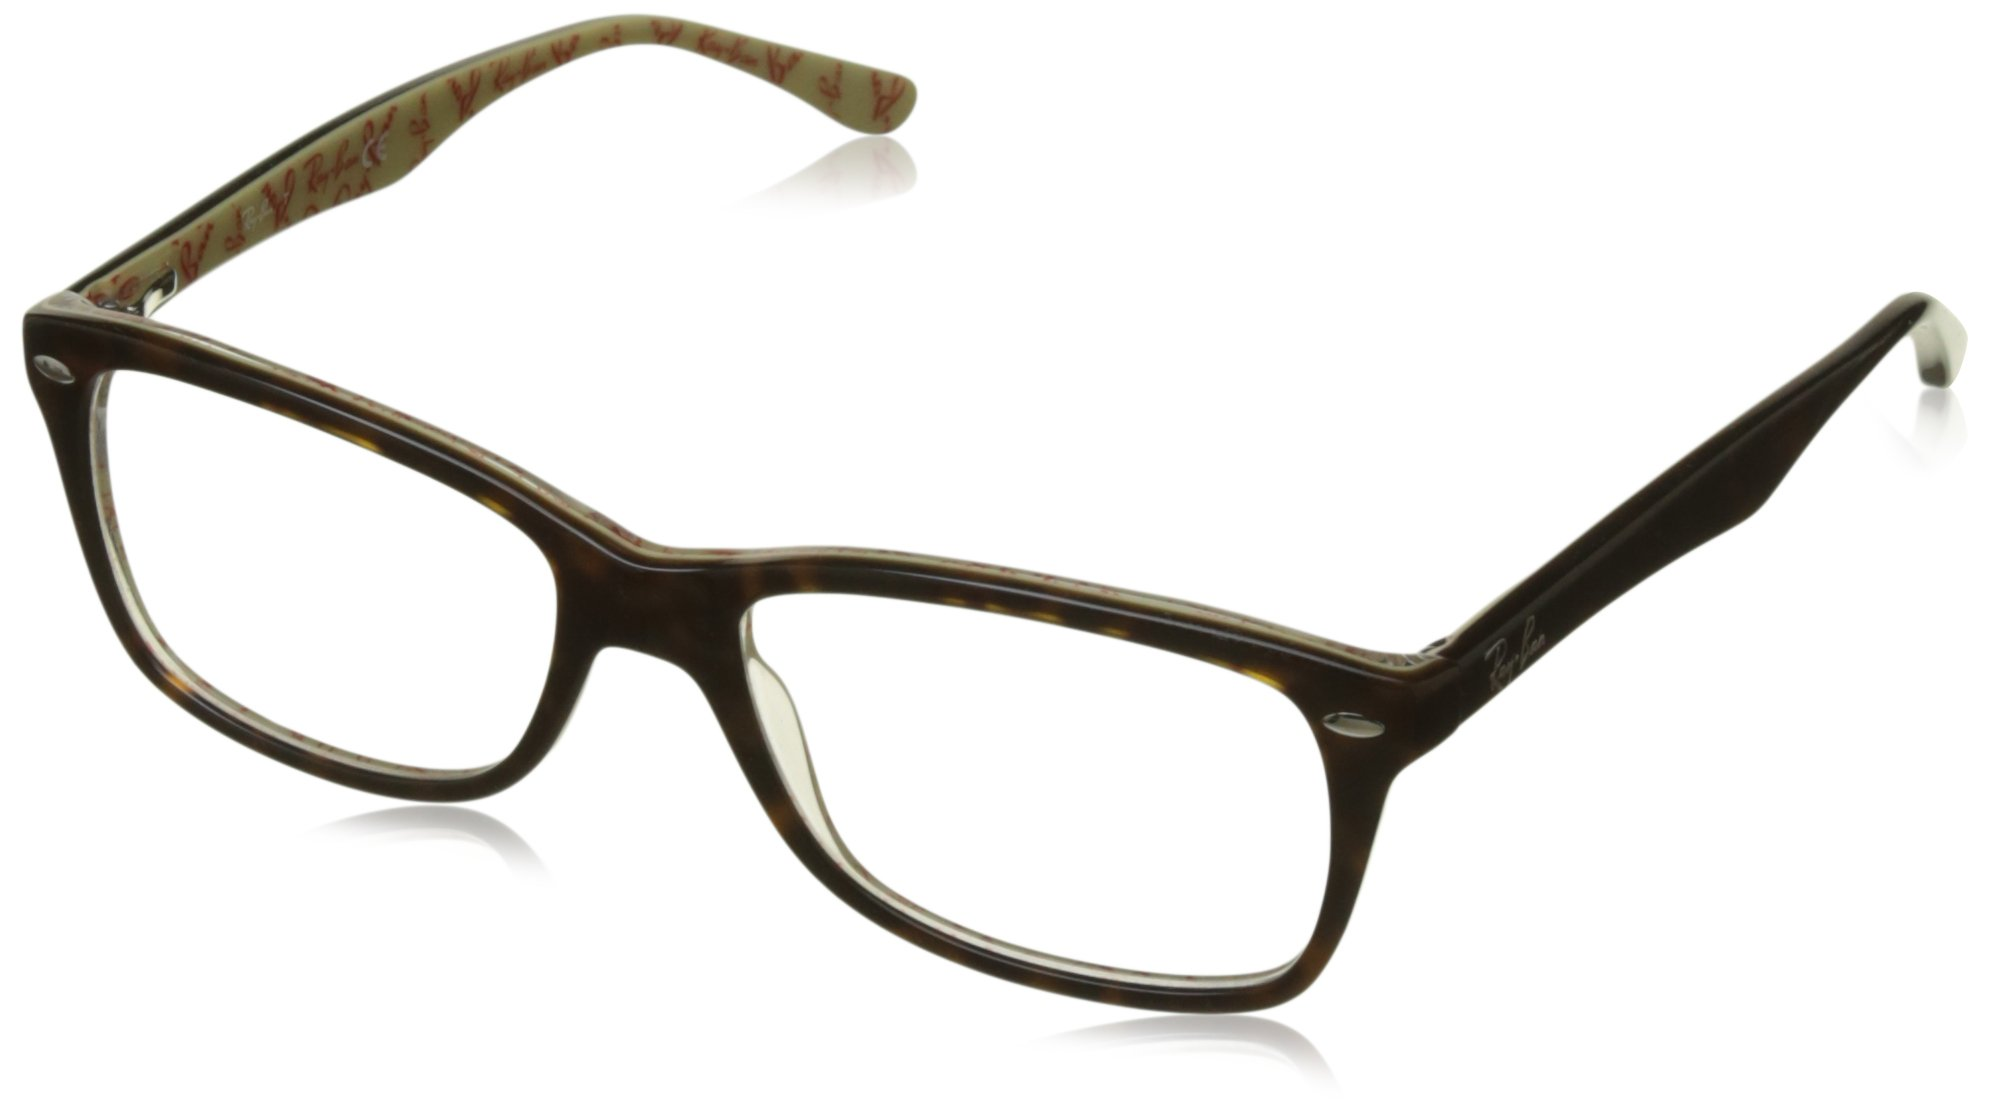 Ray-Ban RX5228 Square Eyeglass Frames, Dark Tortoise On Beige Texture/Demo Lens, 55 mm